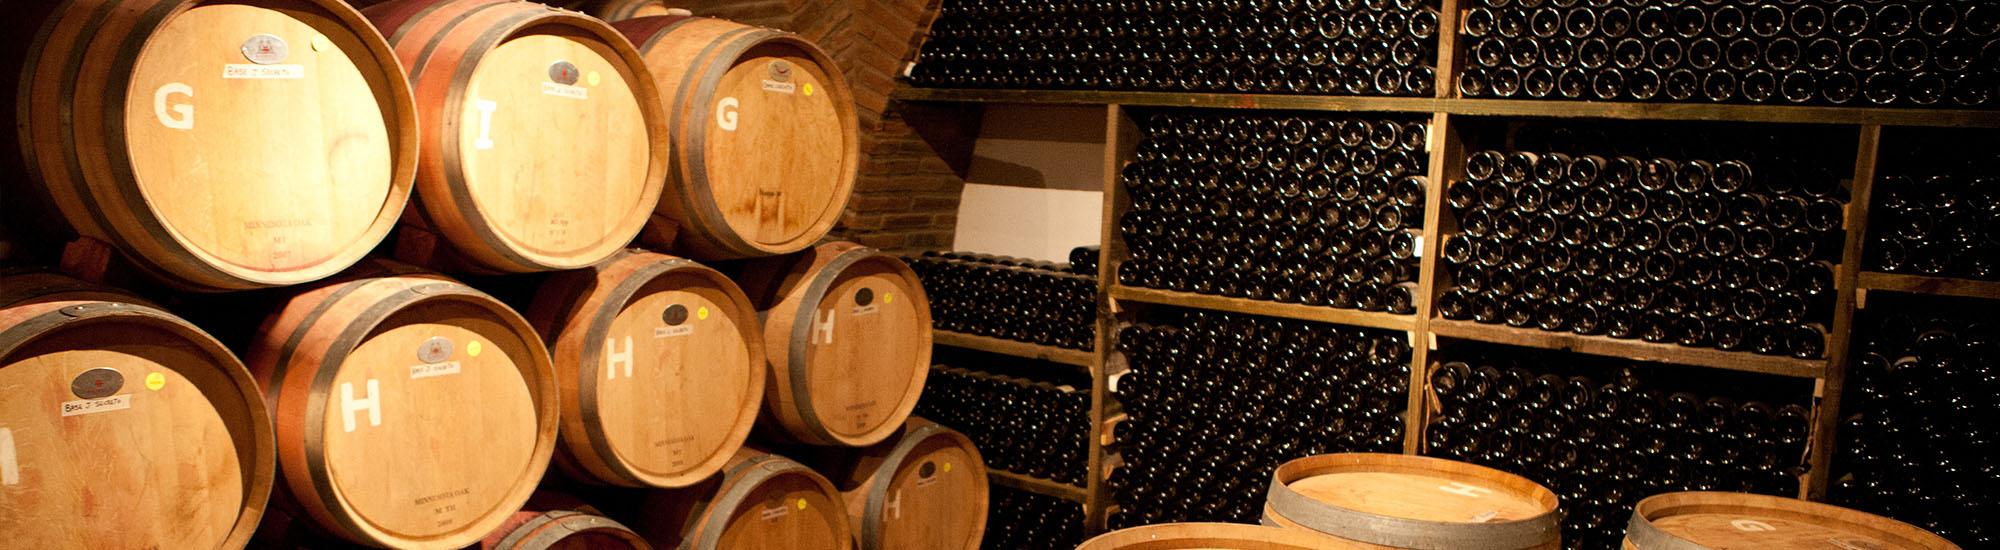 Adobe_guadalupe_winery